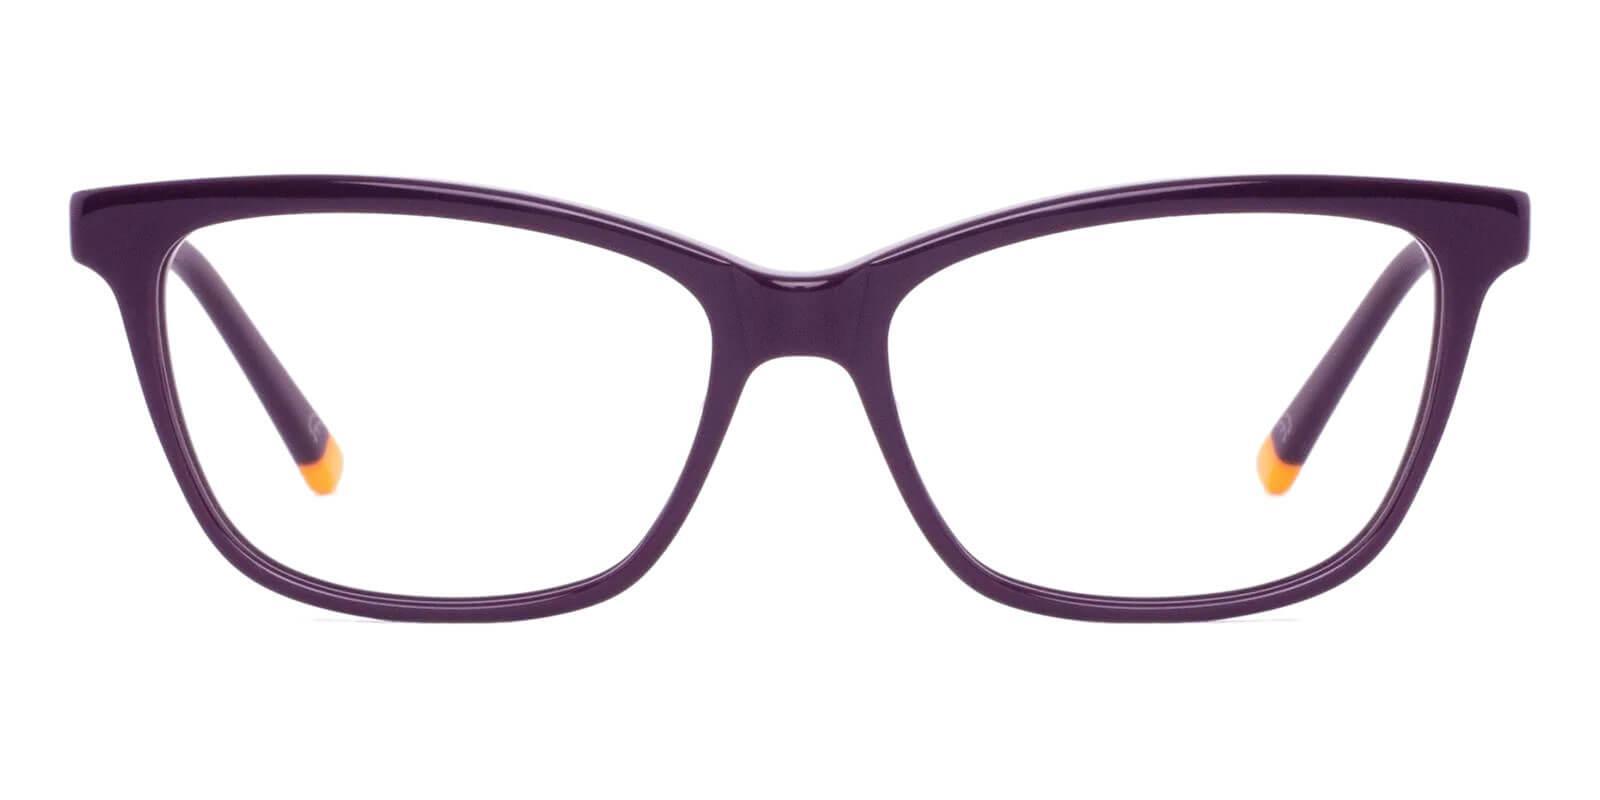 Estonia Purple Acetate Eyeglasses , SpringHinges , UniversalBridgeFit Frames from ABBE Glasses